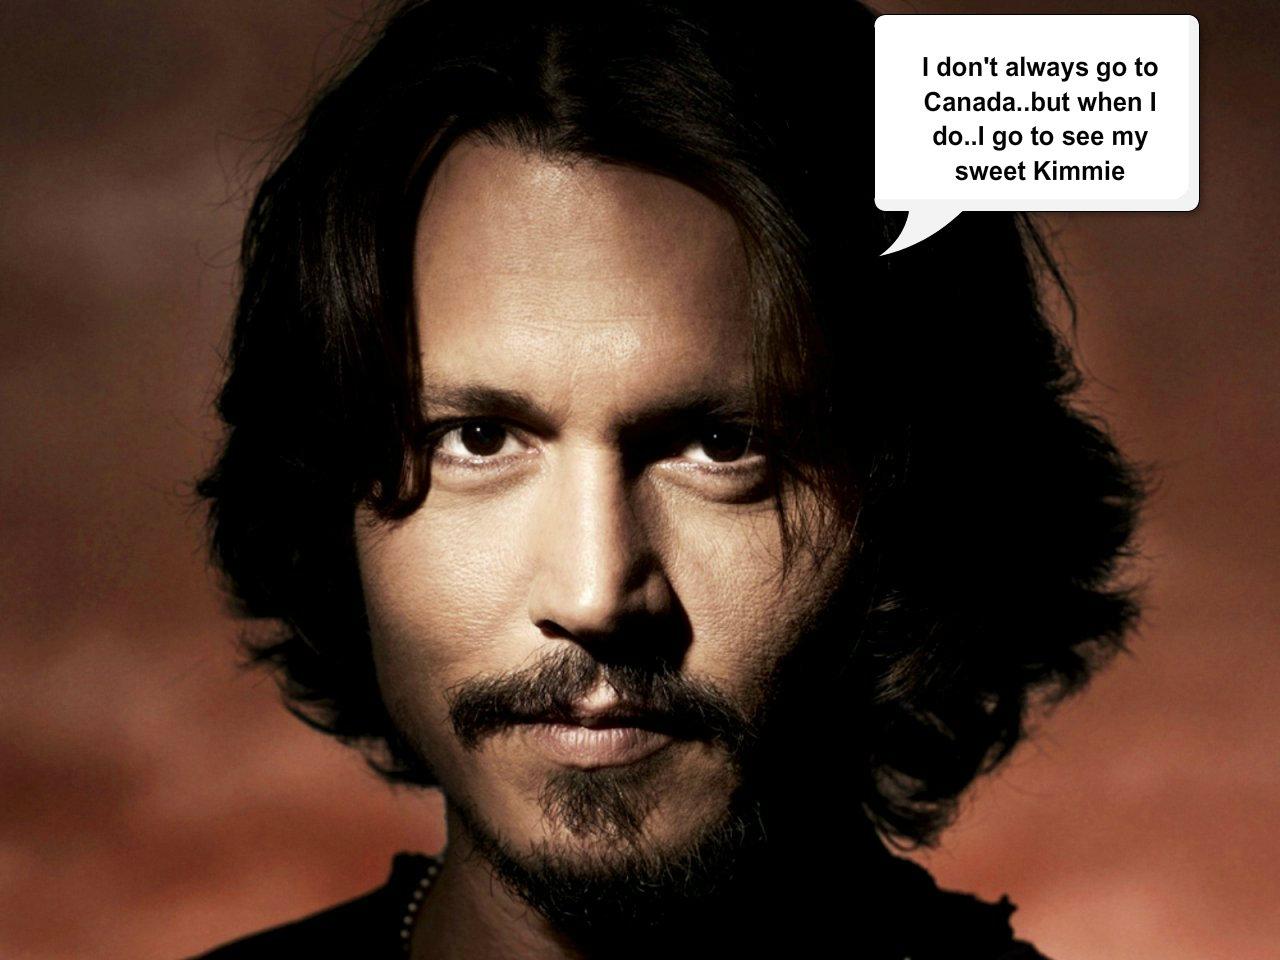 Johnny Depp images johnny depp HD wallpaper and background photos ... Johnny Depp